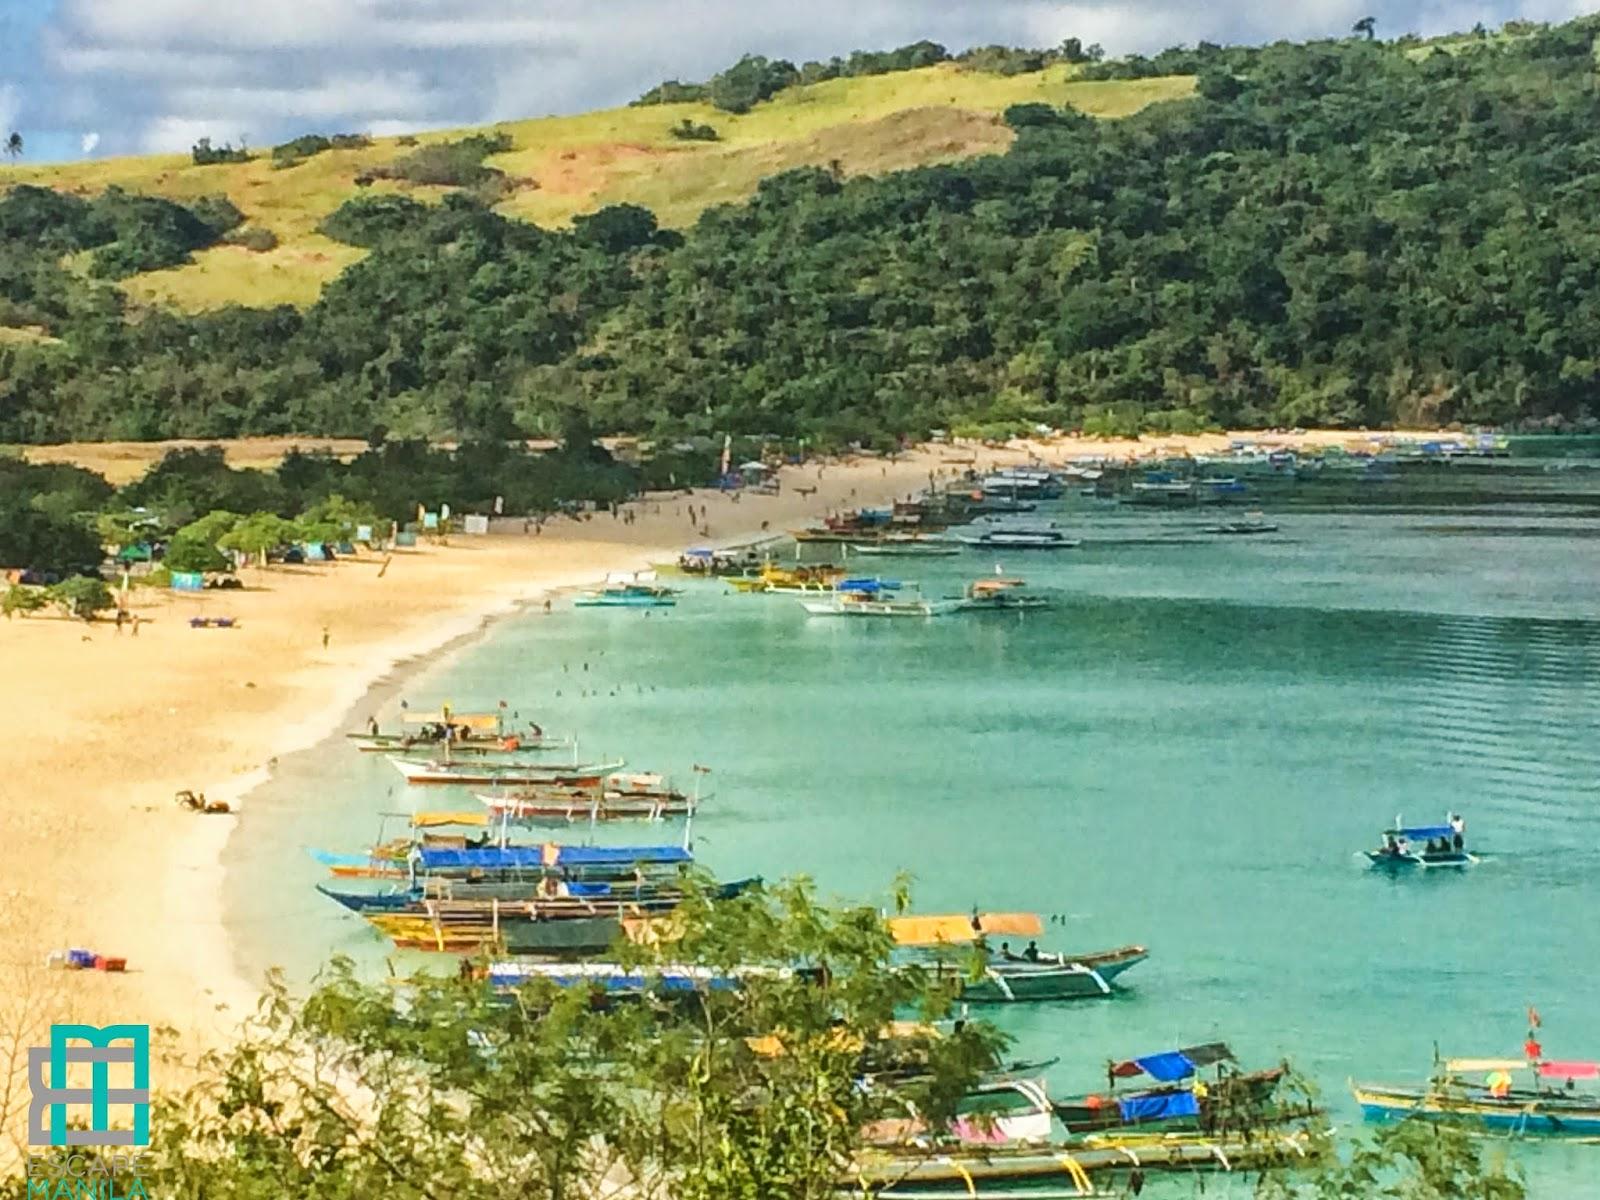 Calaguas Island - one of the best tourist spots in Camarines Norte